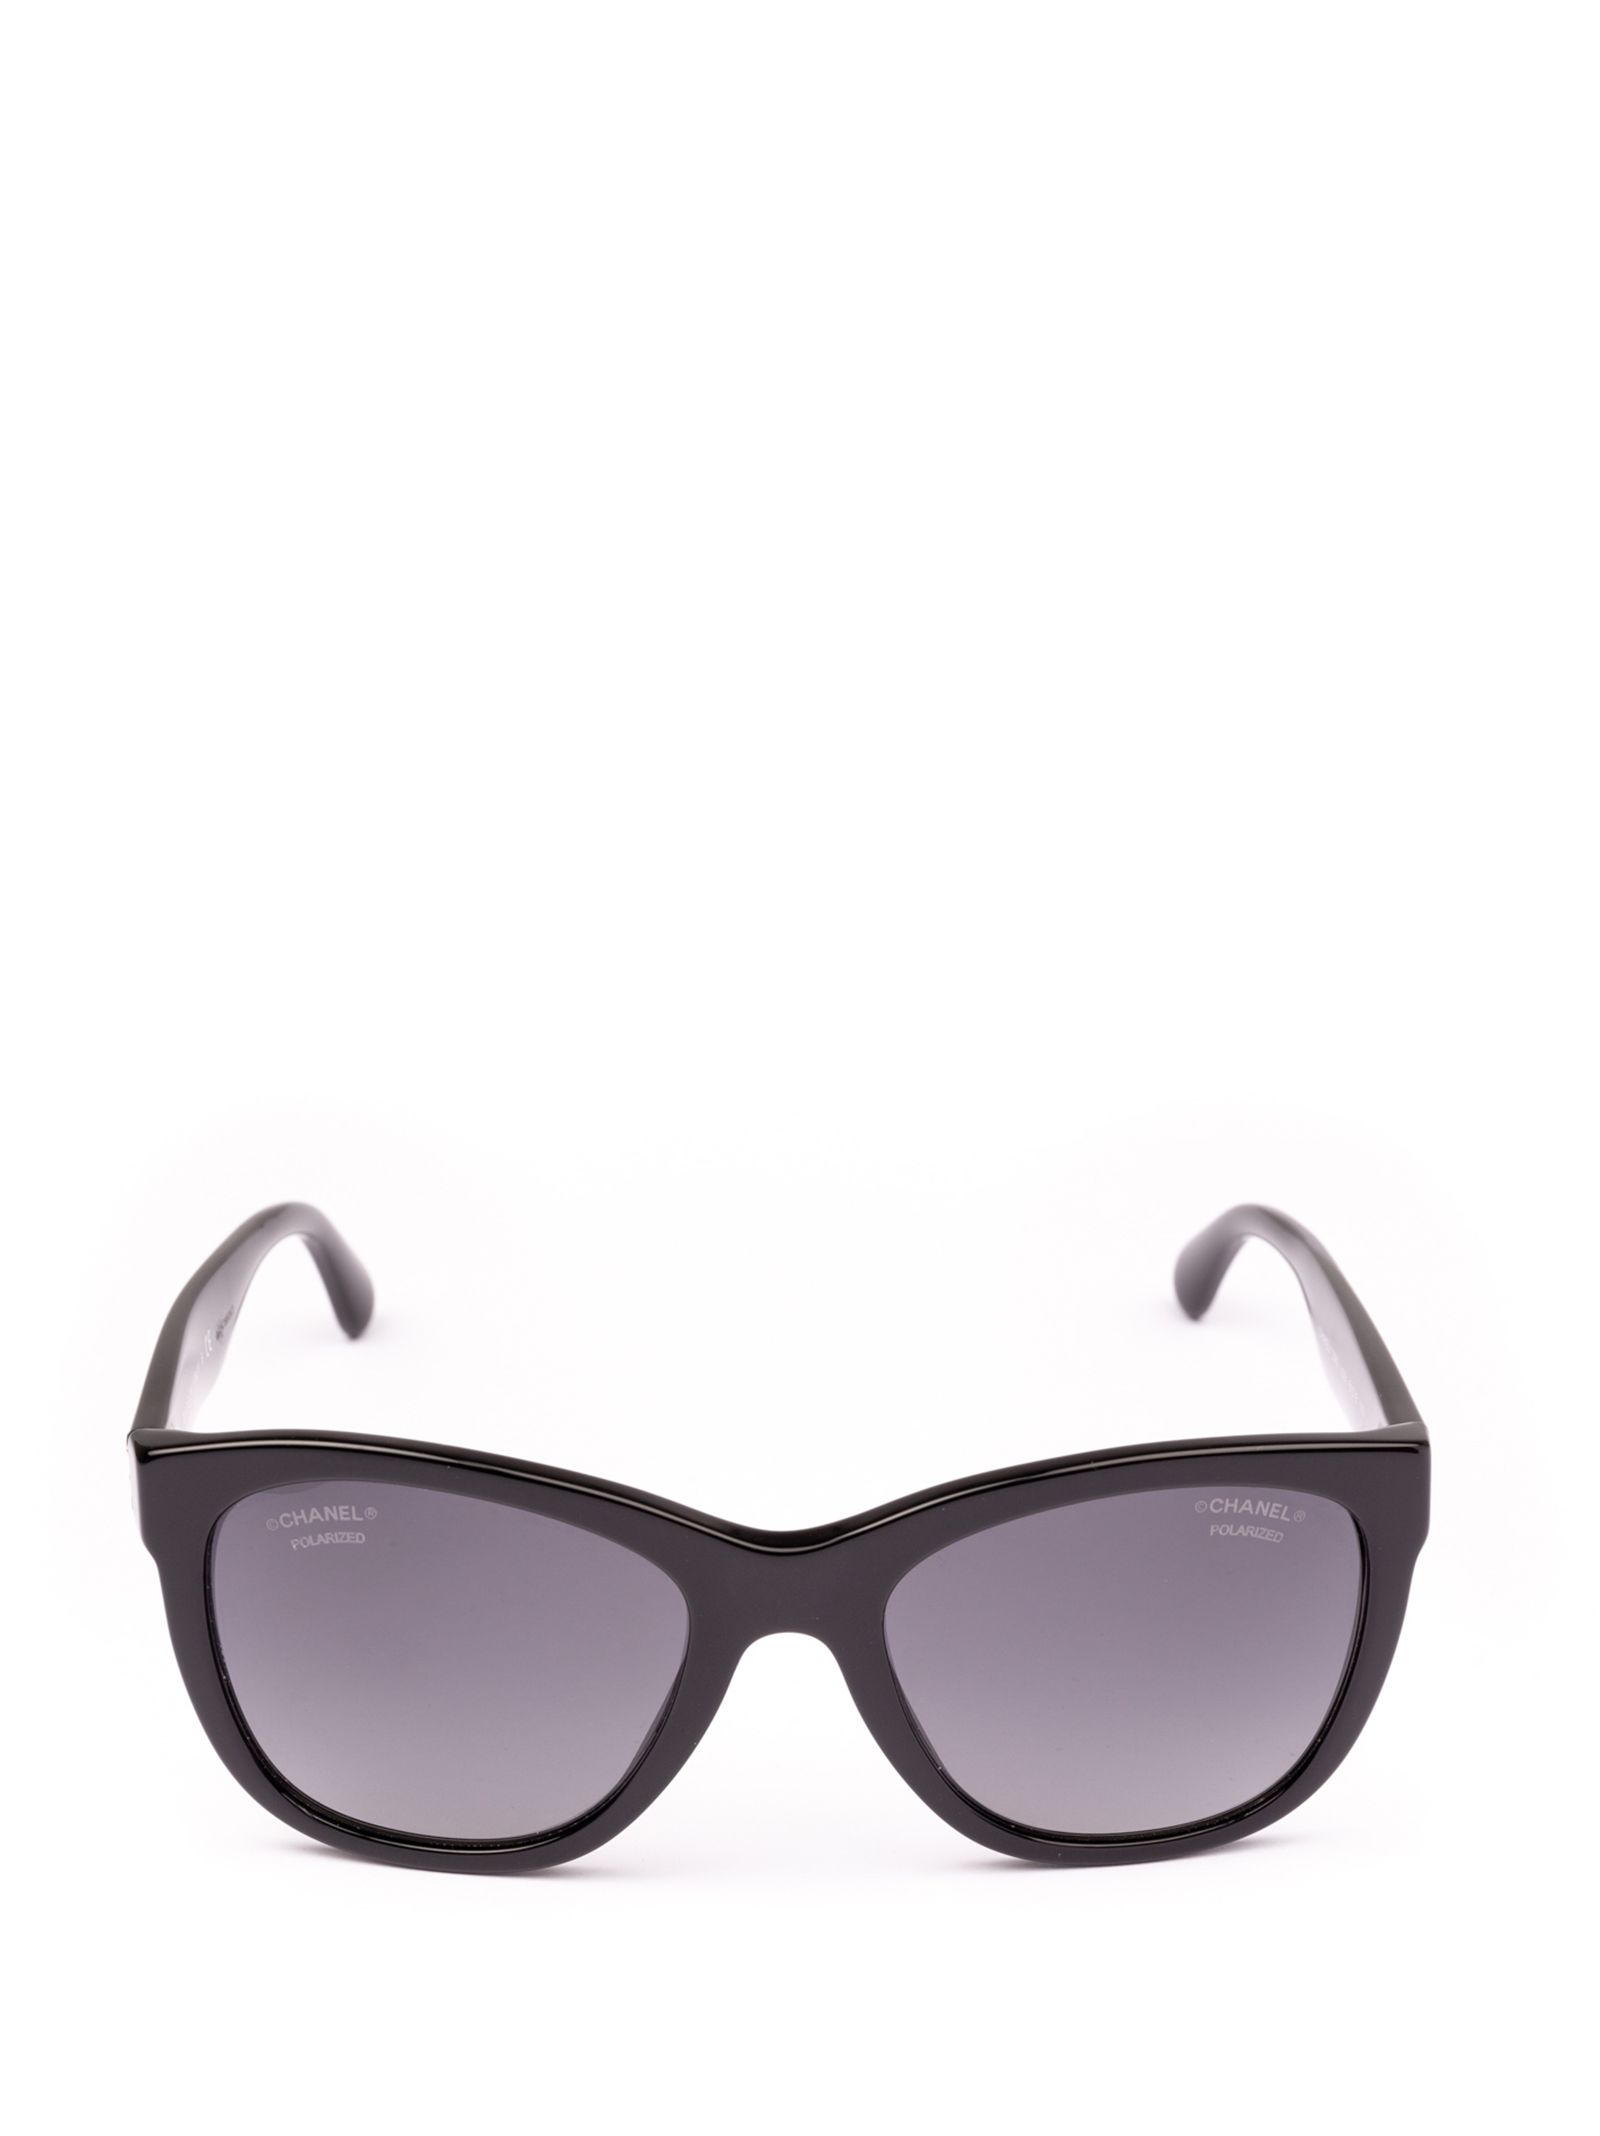 Chanel Sunglasses In C.501 | ModeSens